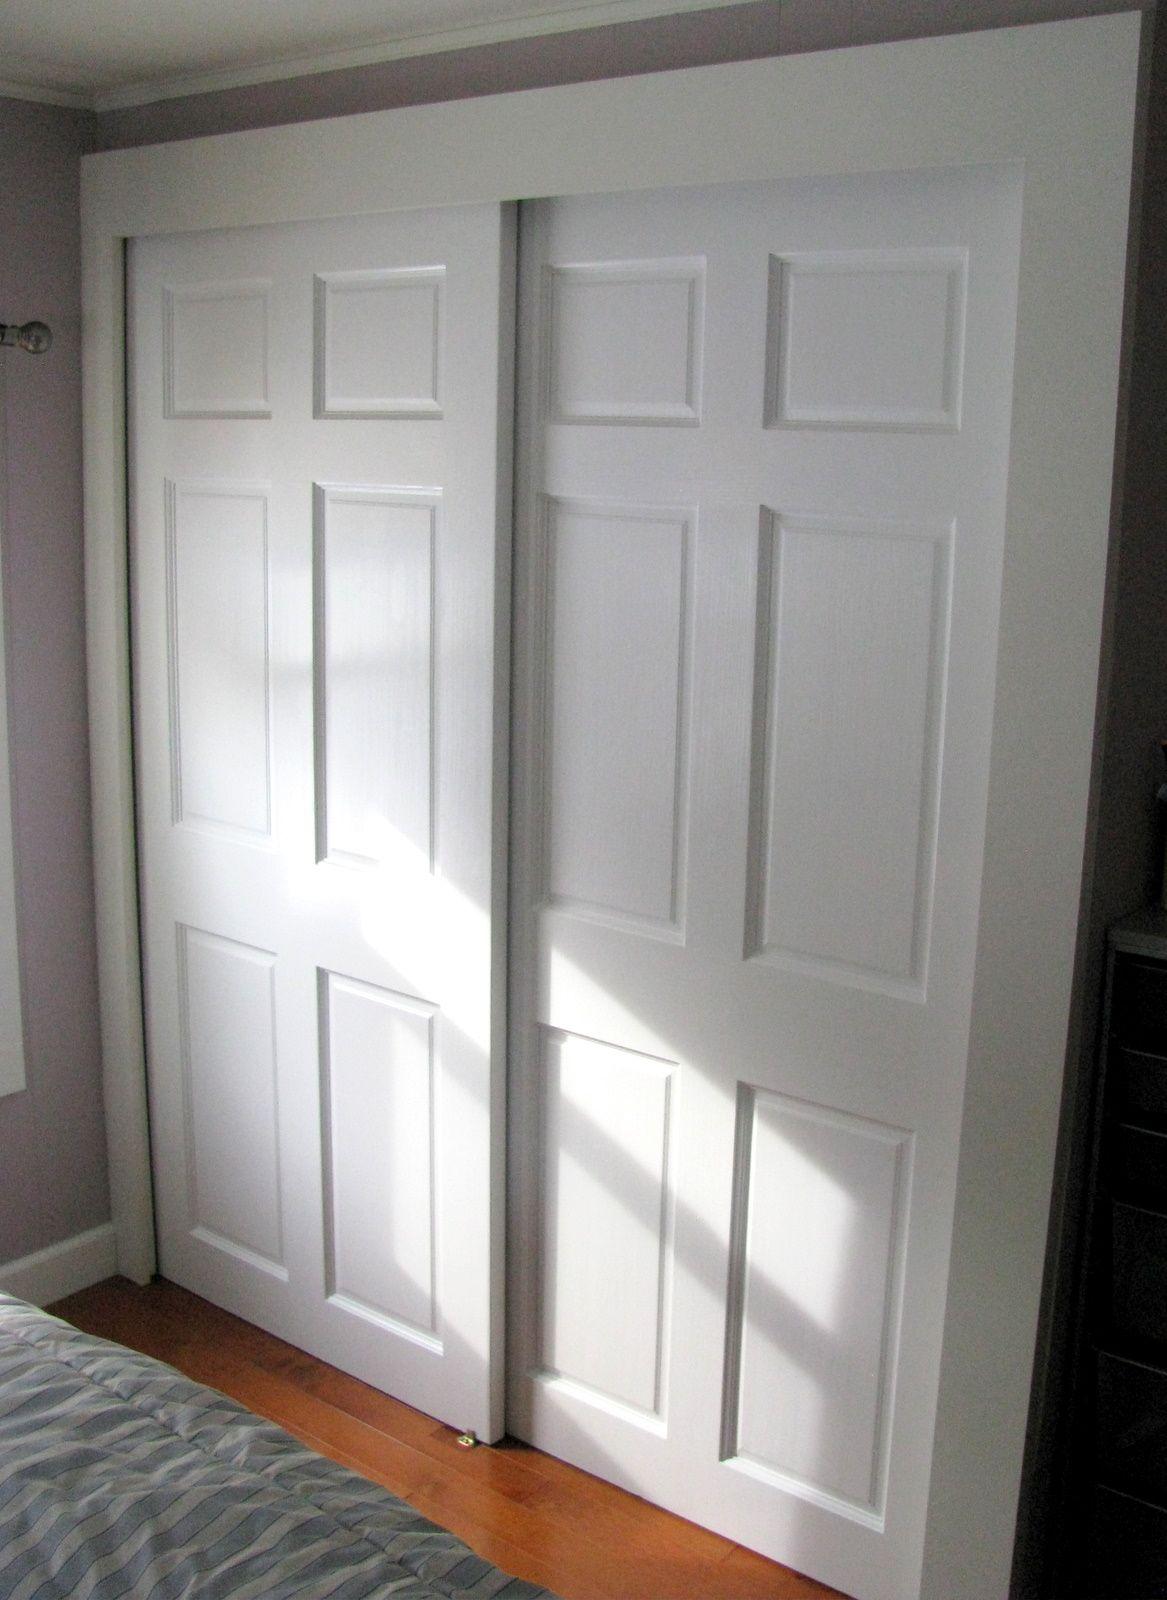 Exciting Sliding Closet Doors For Bedrooms Parquet Floor